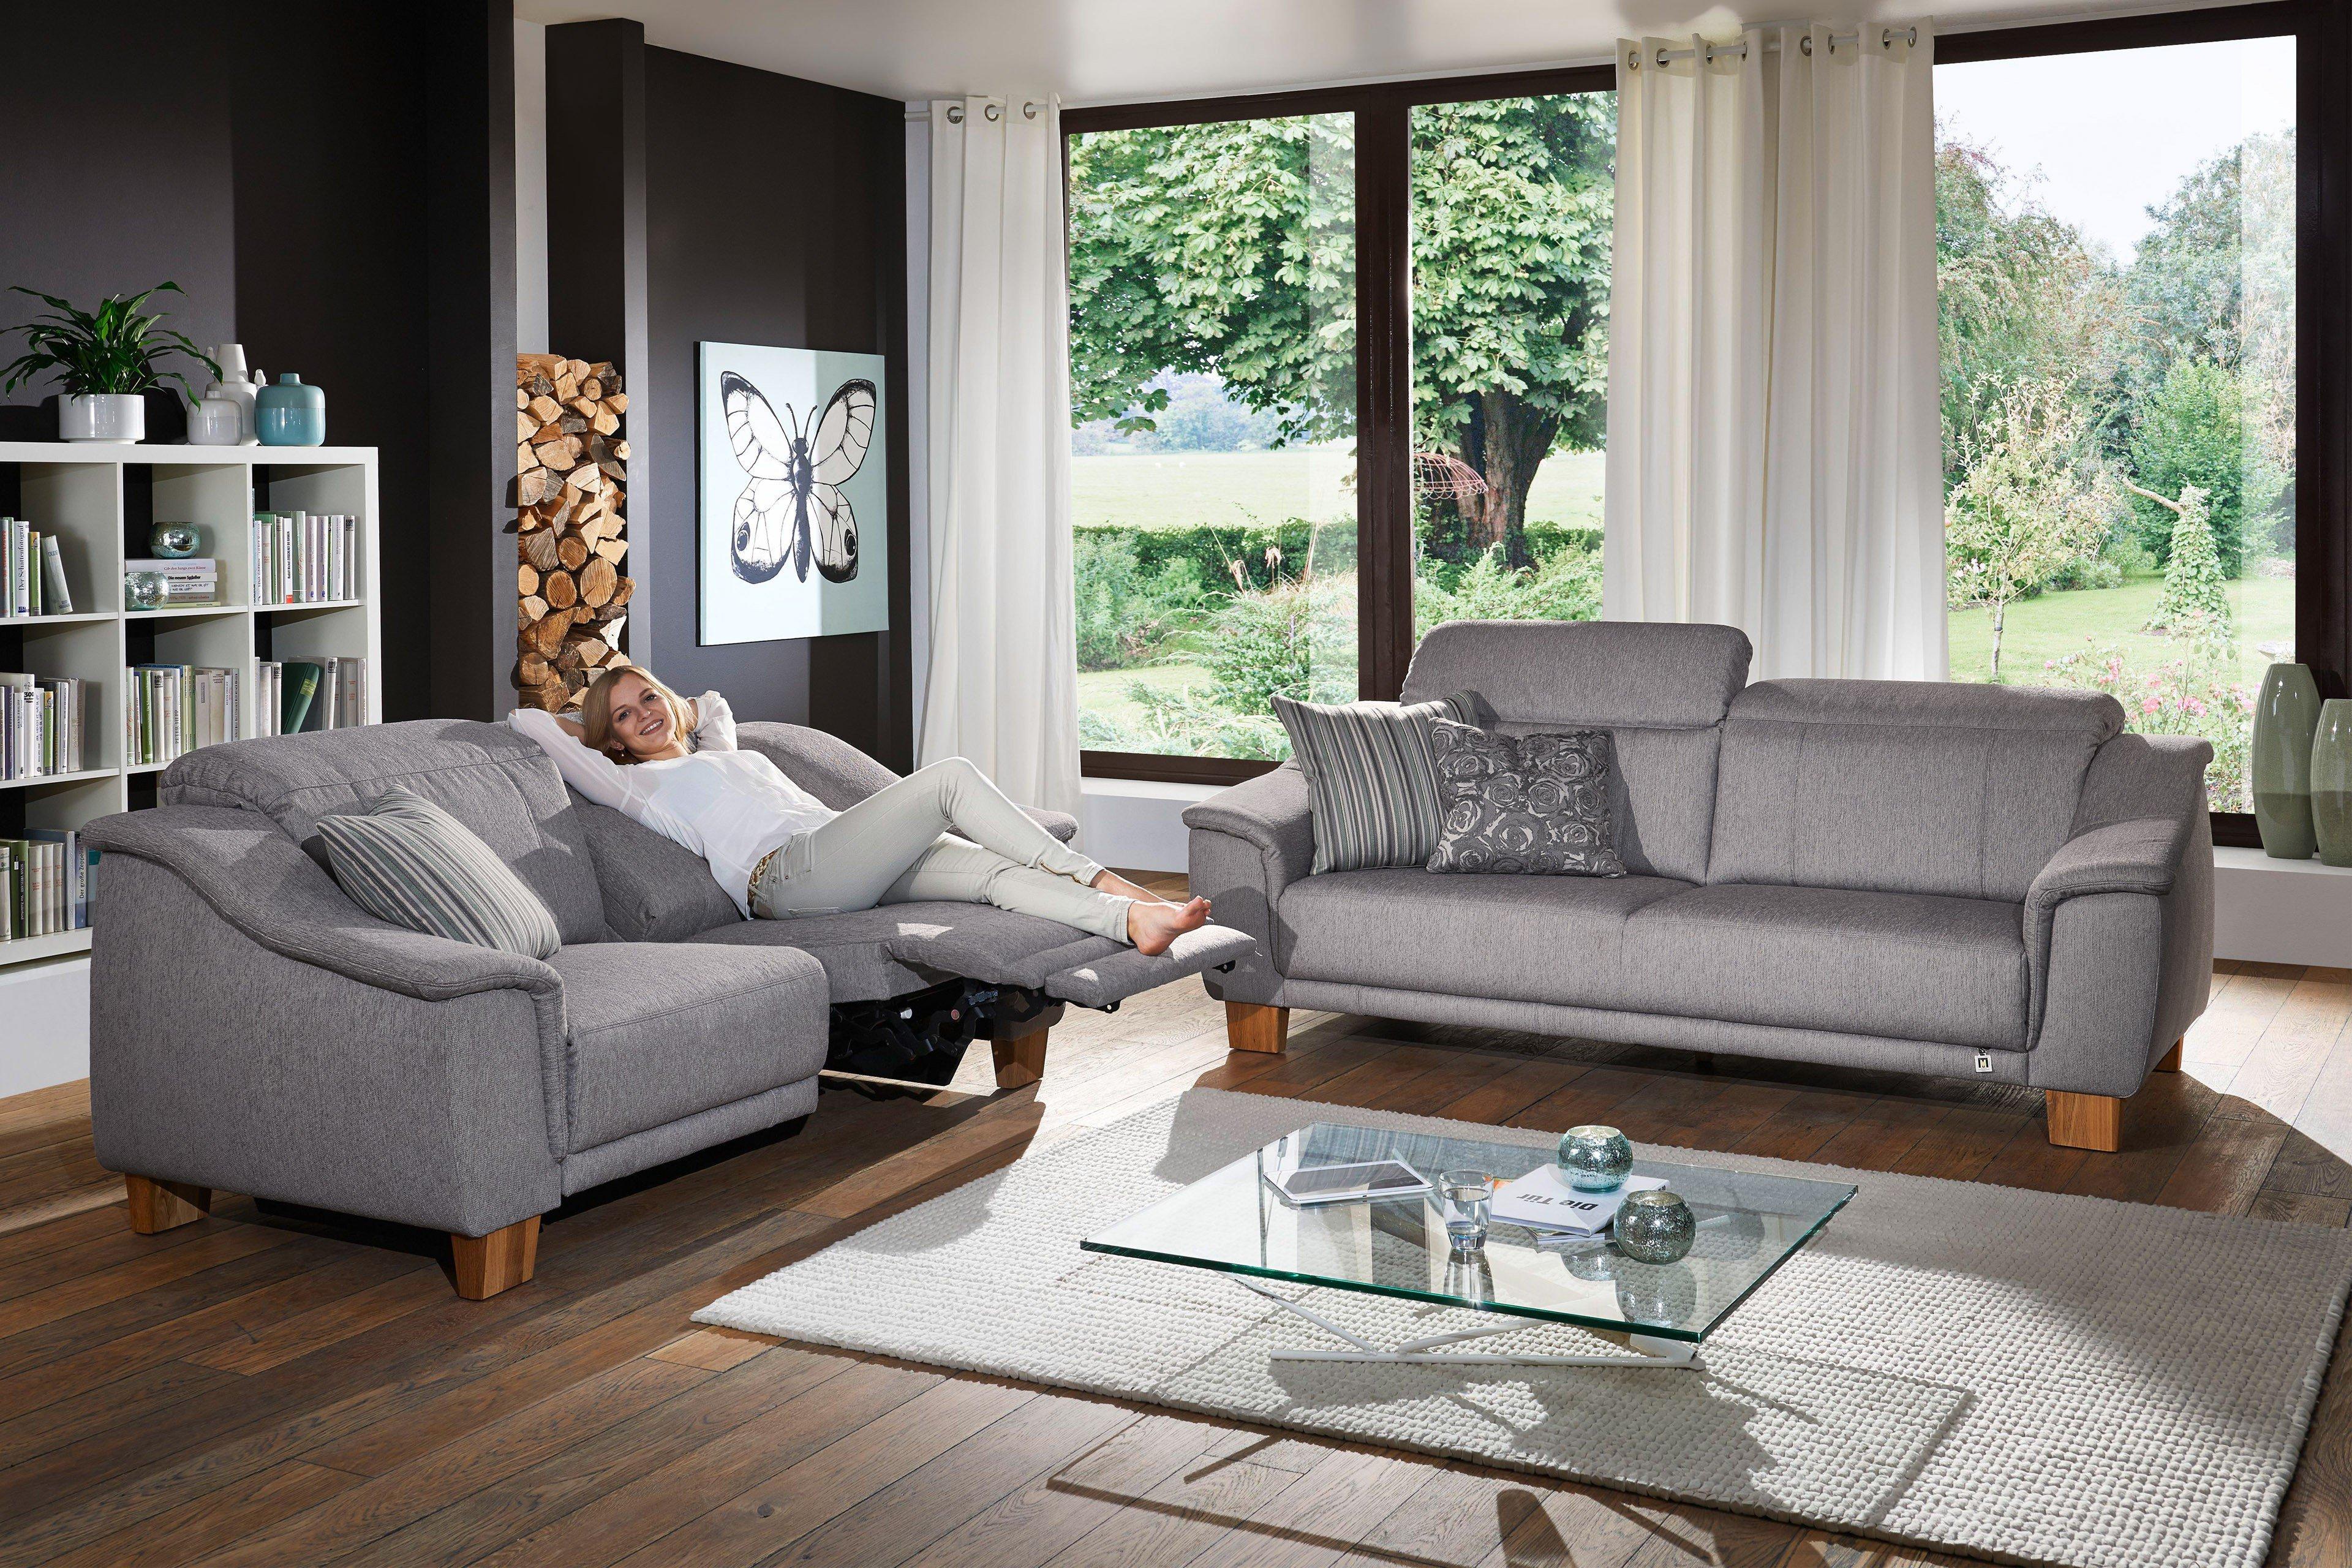 f s polsterm bel 260 messina polstergarnitur in grau m bel letz ihr online shop. Black Bedroom Furniture Sets. Home Design Ideas